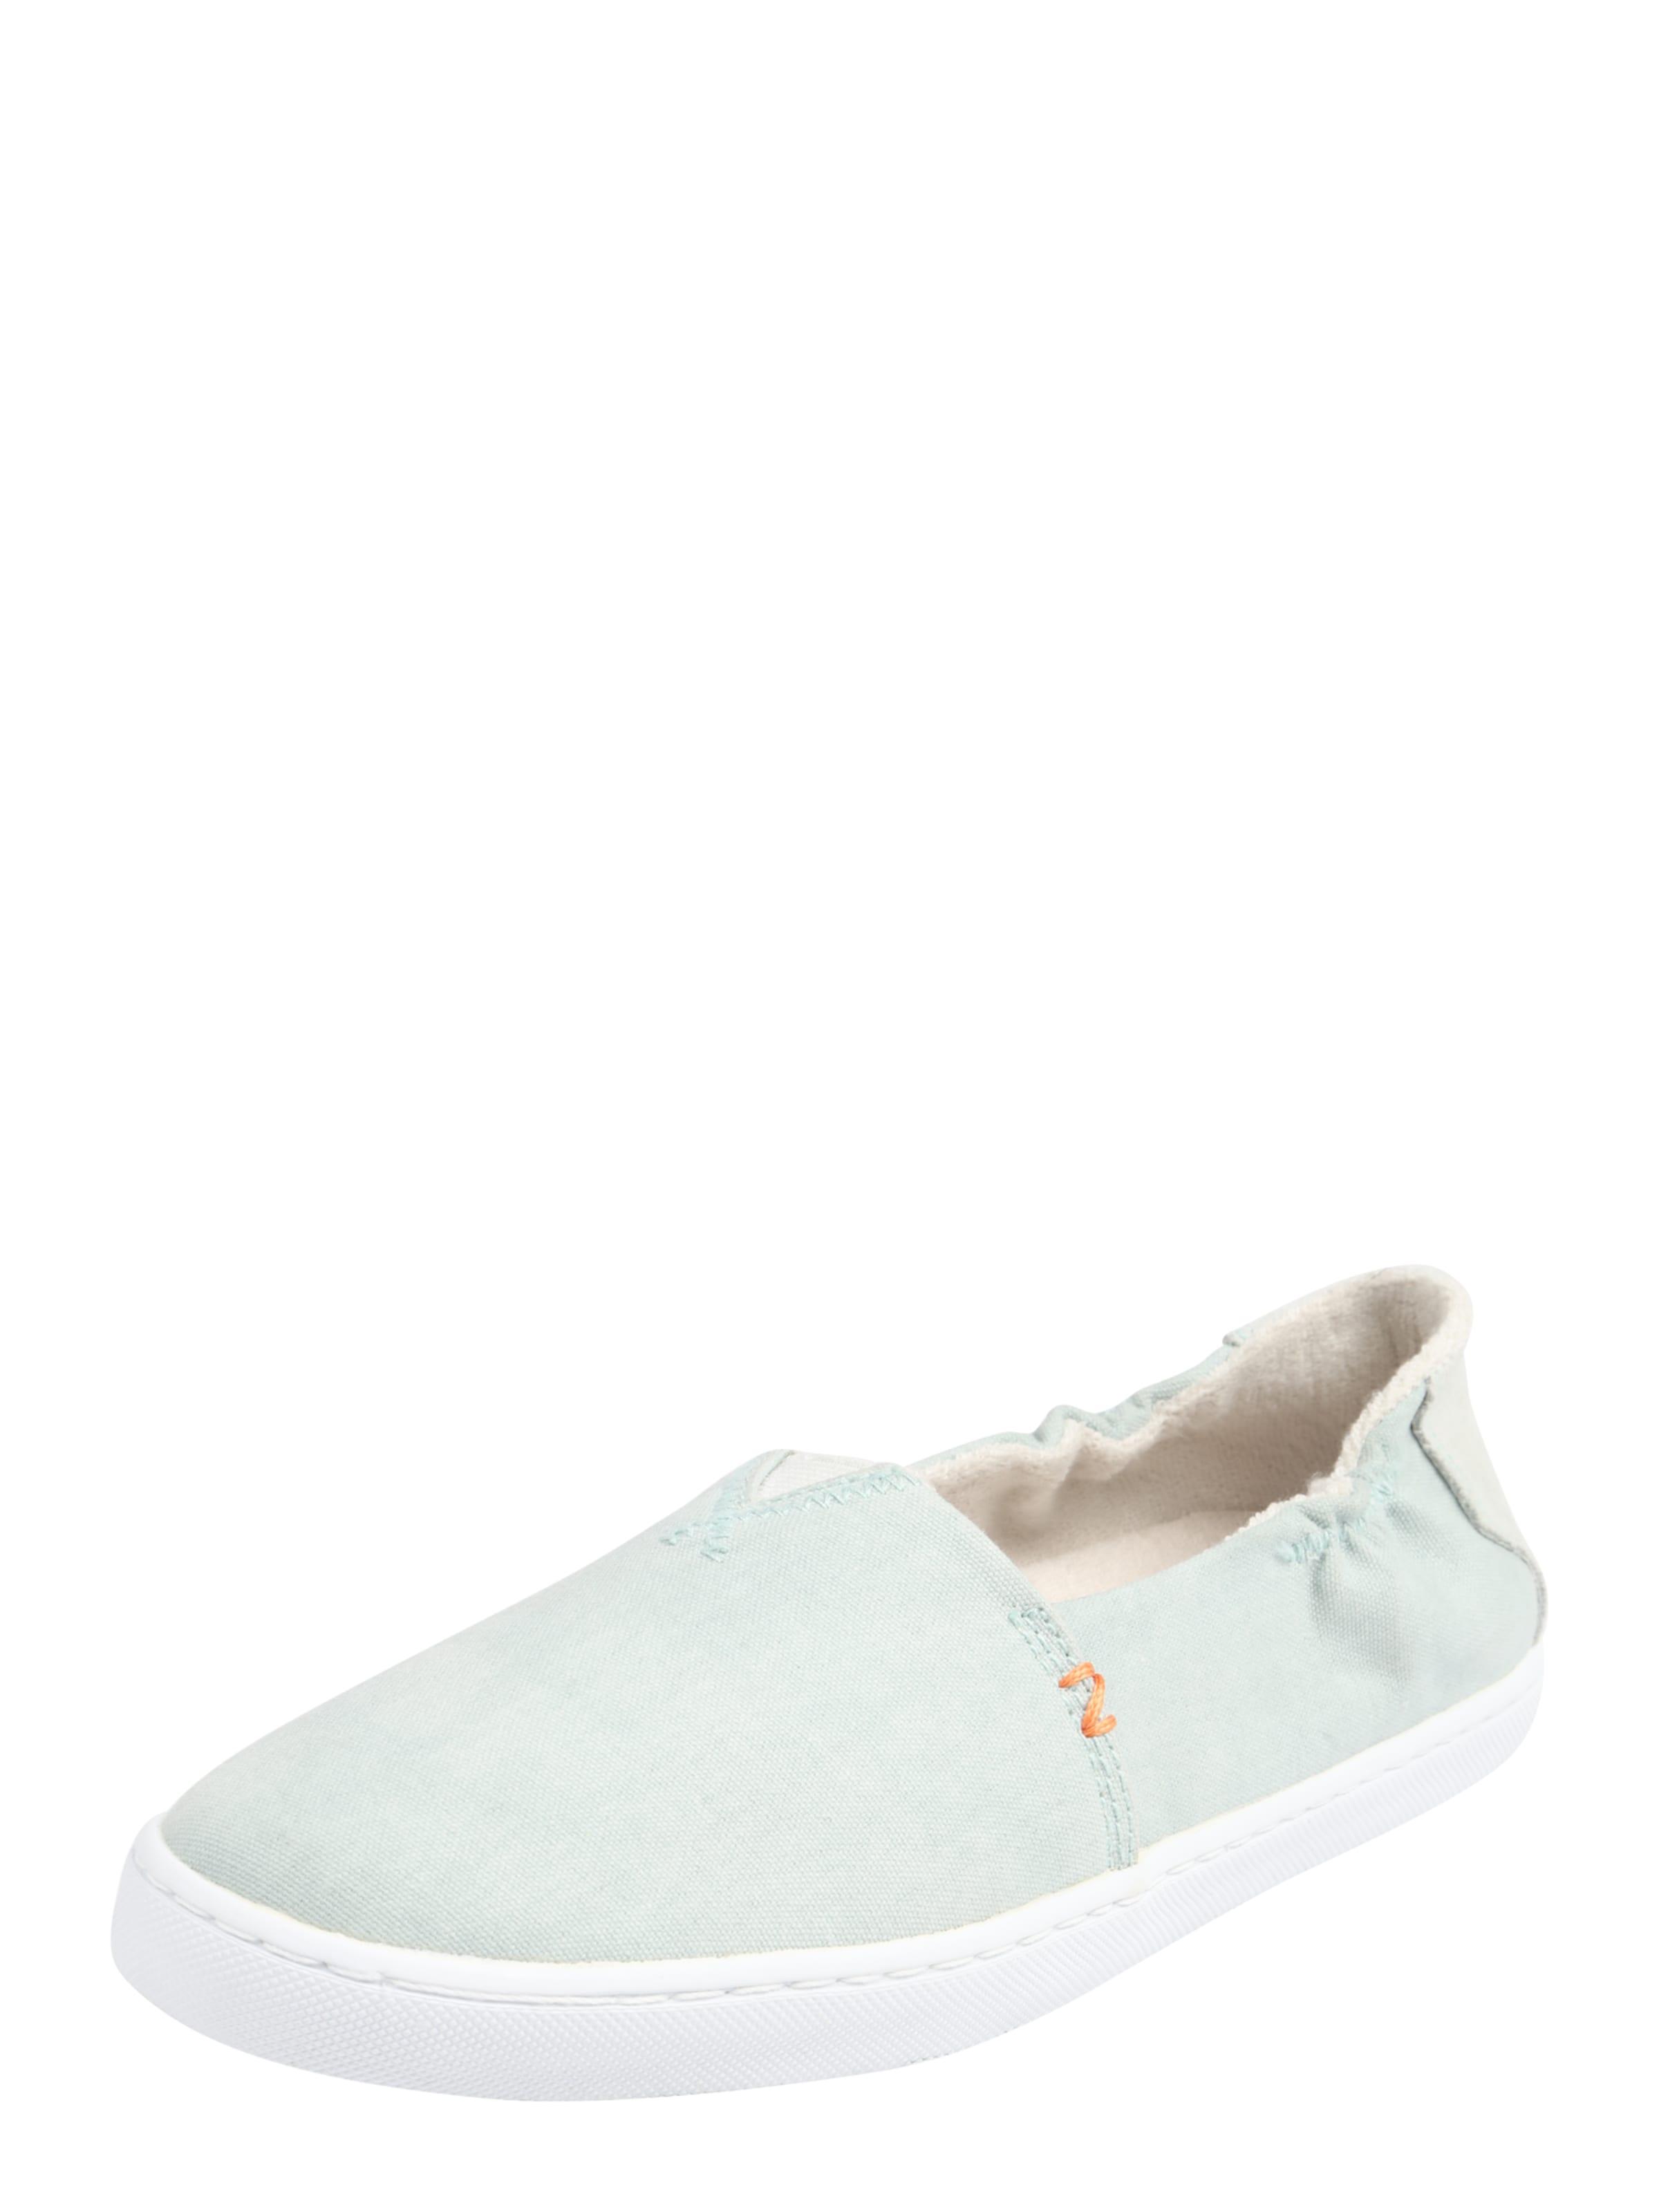 Haltbare Mode billige Schuhe HUB   Slipper 'Fuji' Schuhe Gut getragene Schuhe